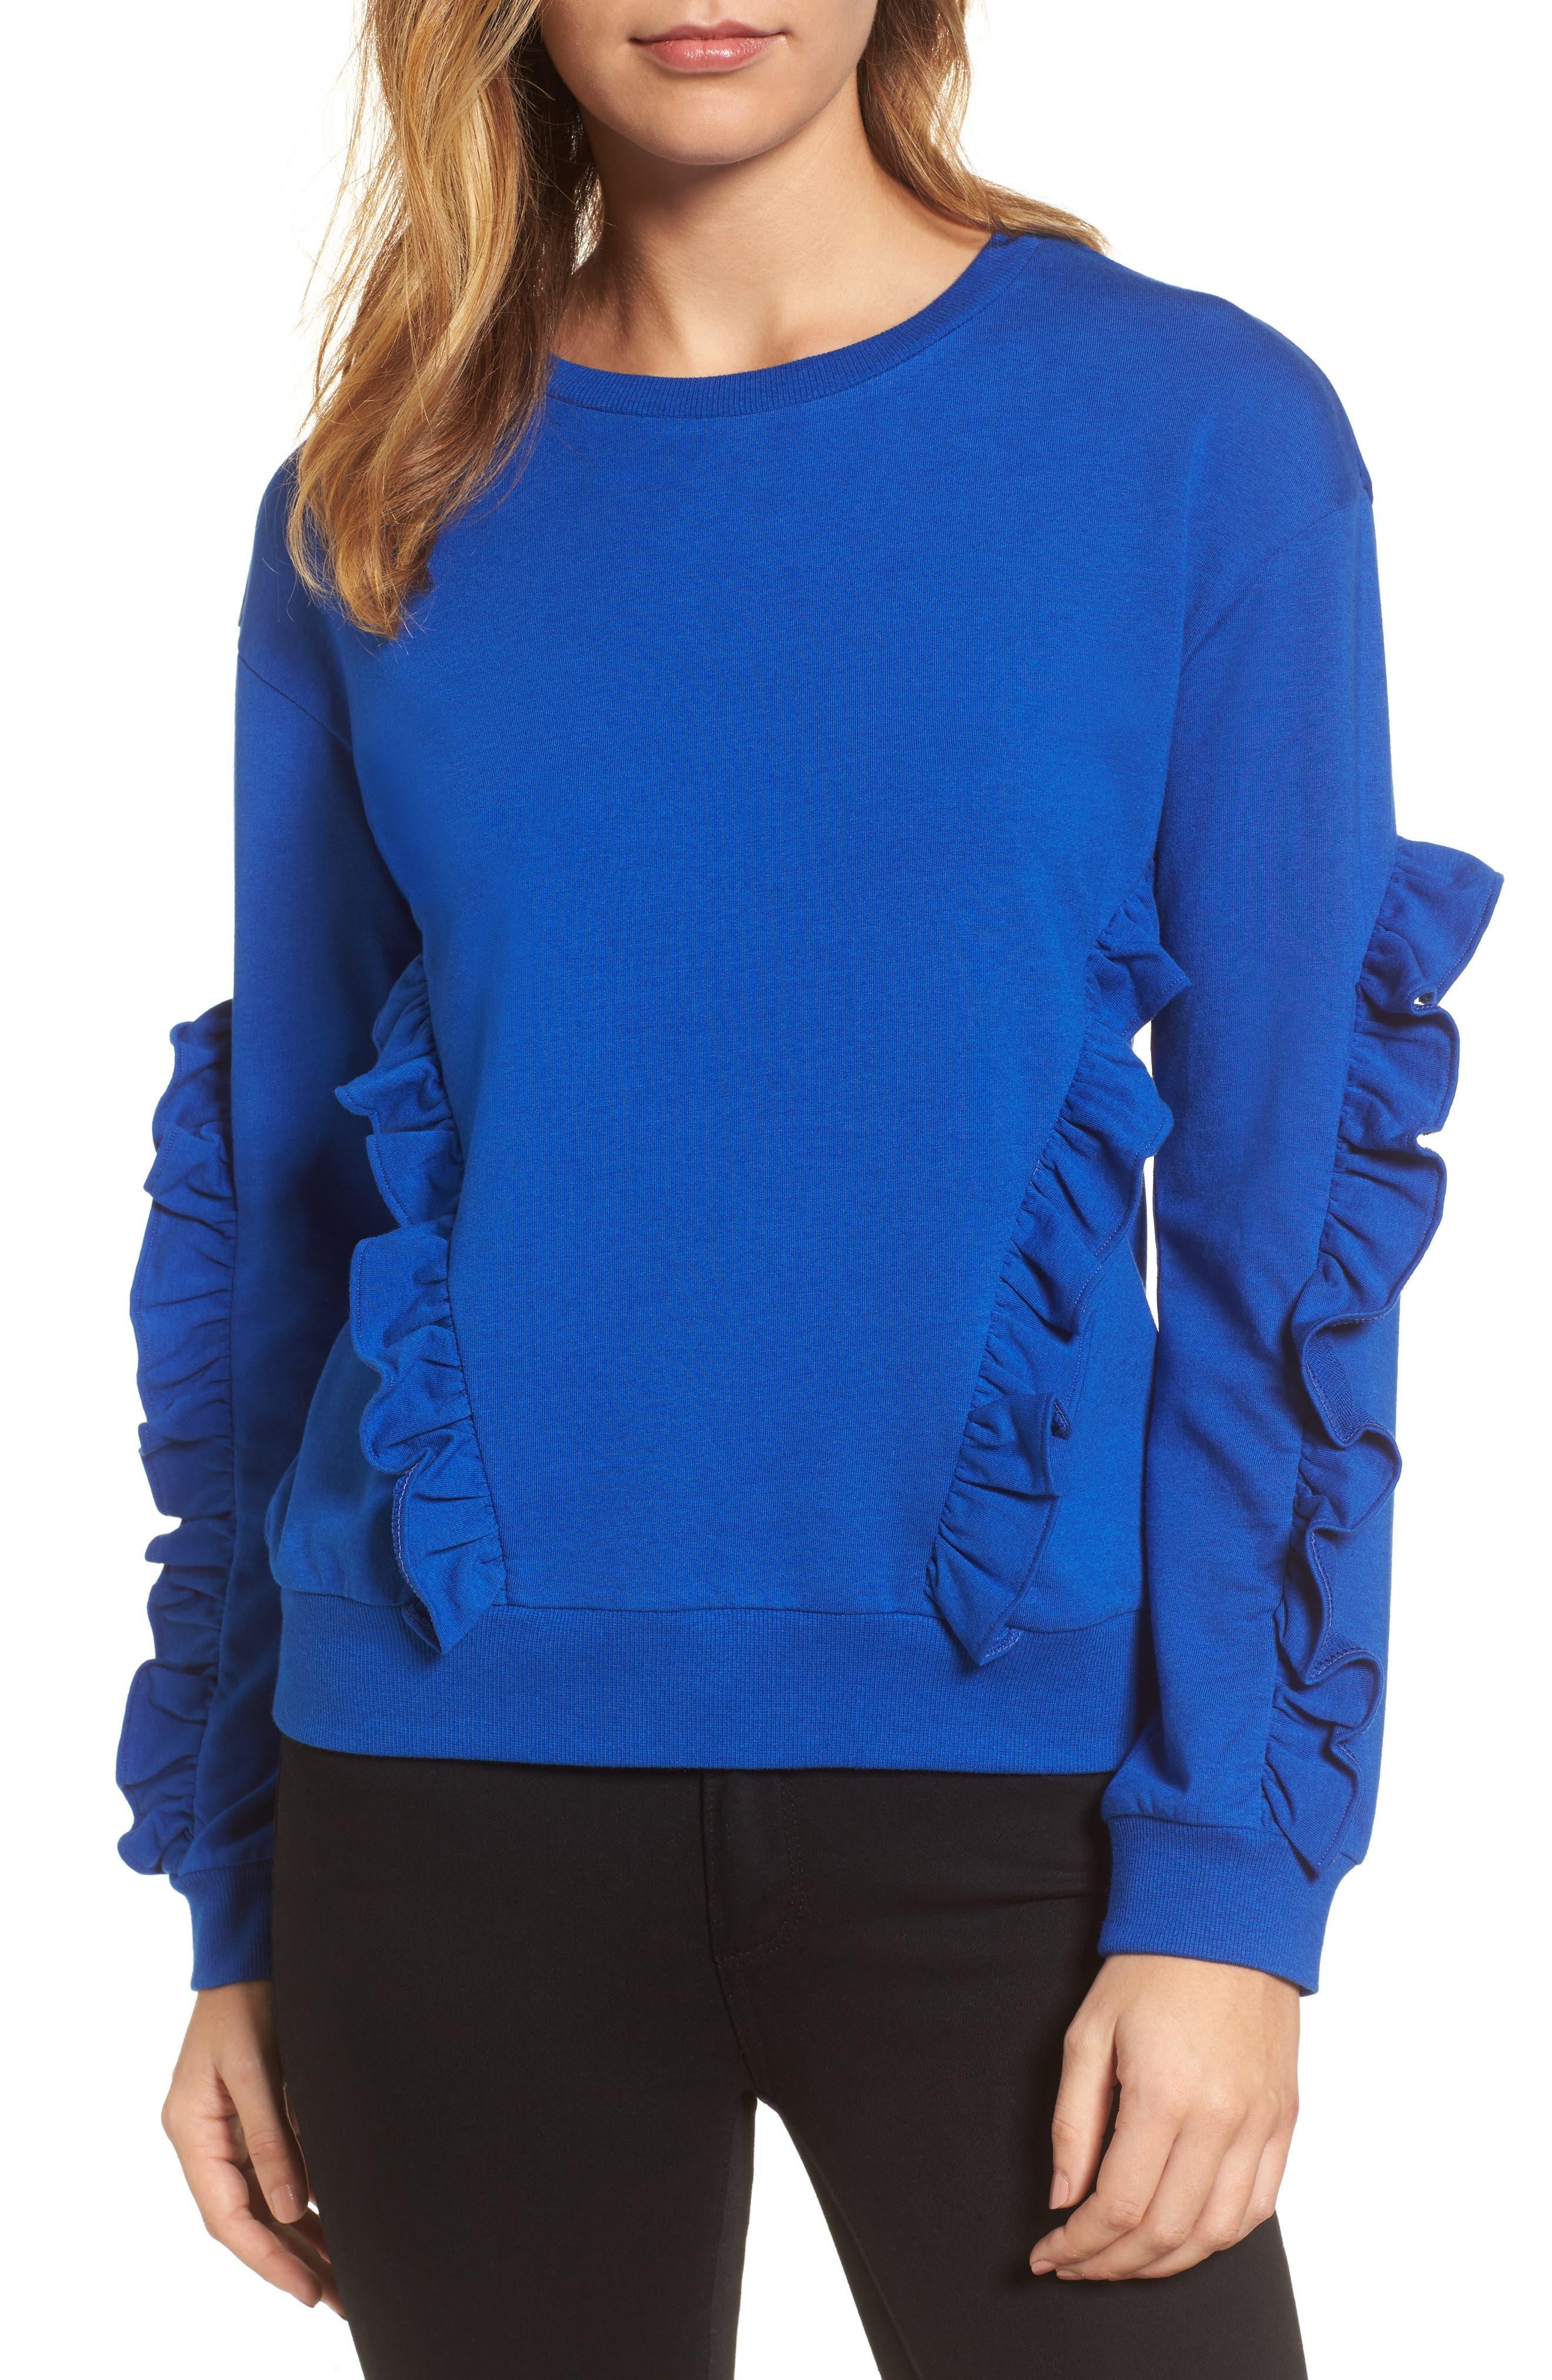 Ruffle Detail Sweatshirt,                         Main,                         color, Blue Surf